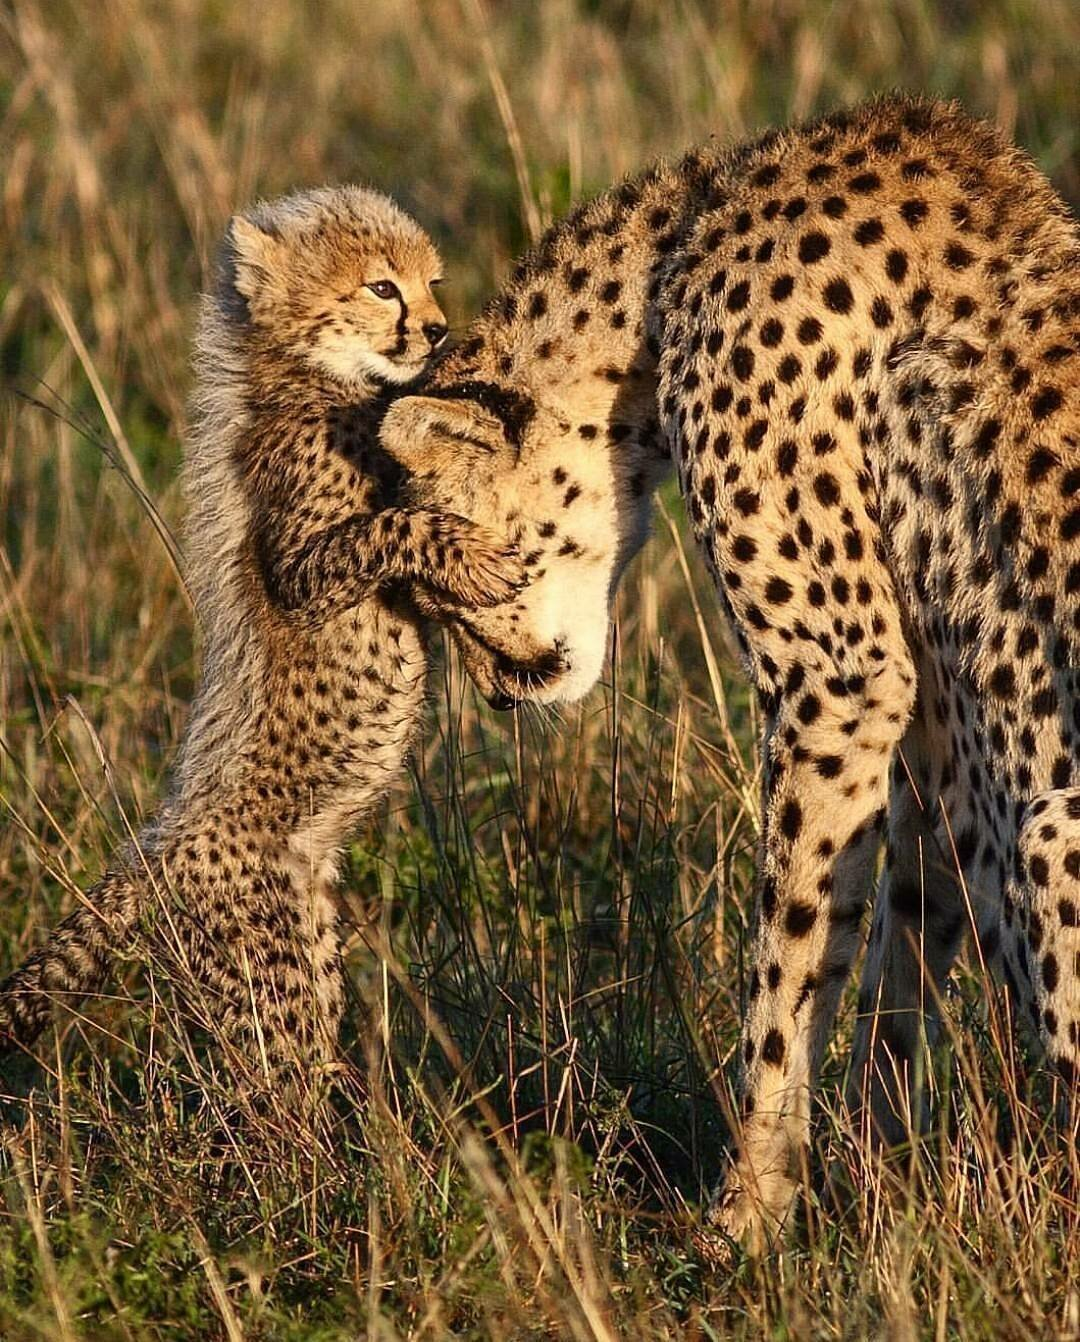 следующем гепард и леопард разница фото сфотографировала, увидела фото